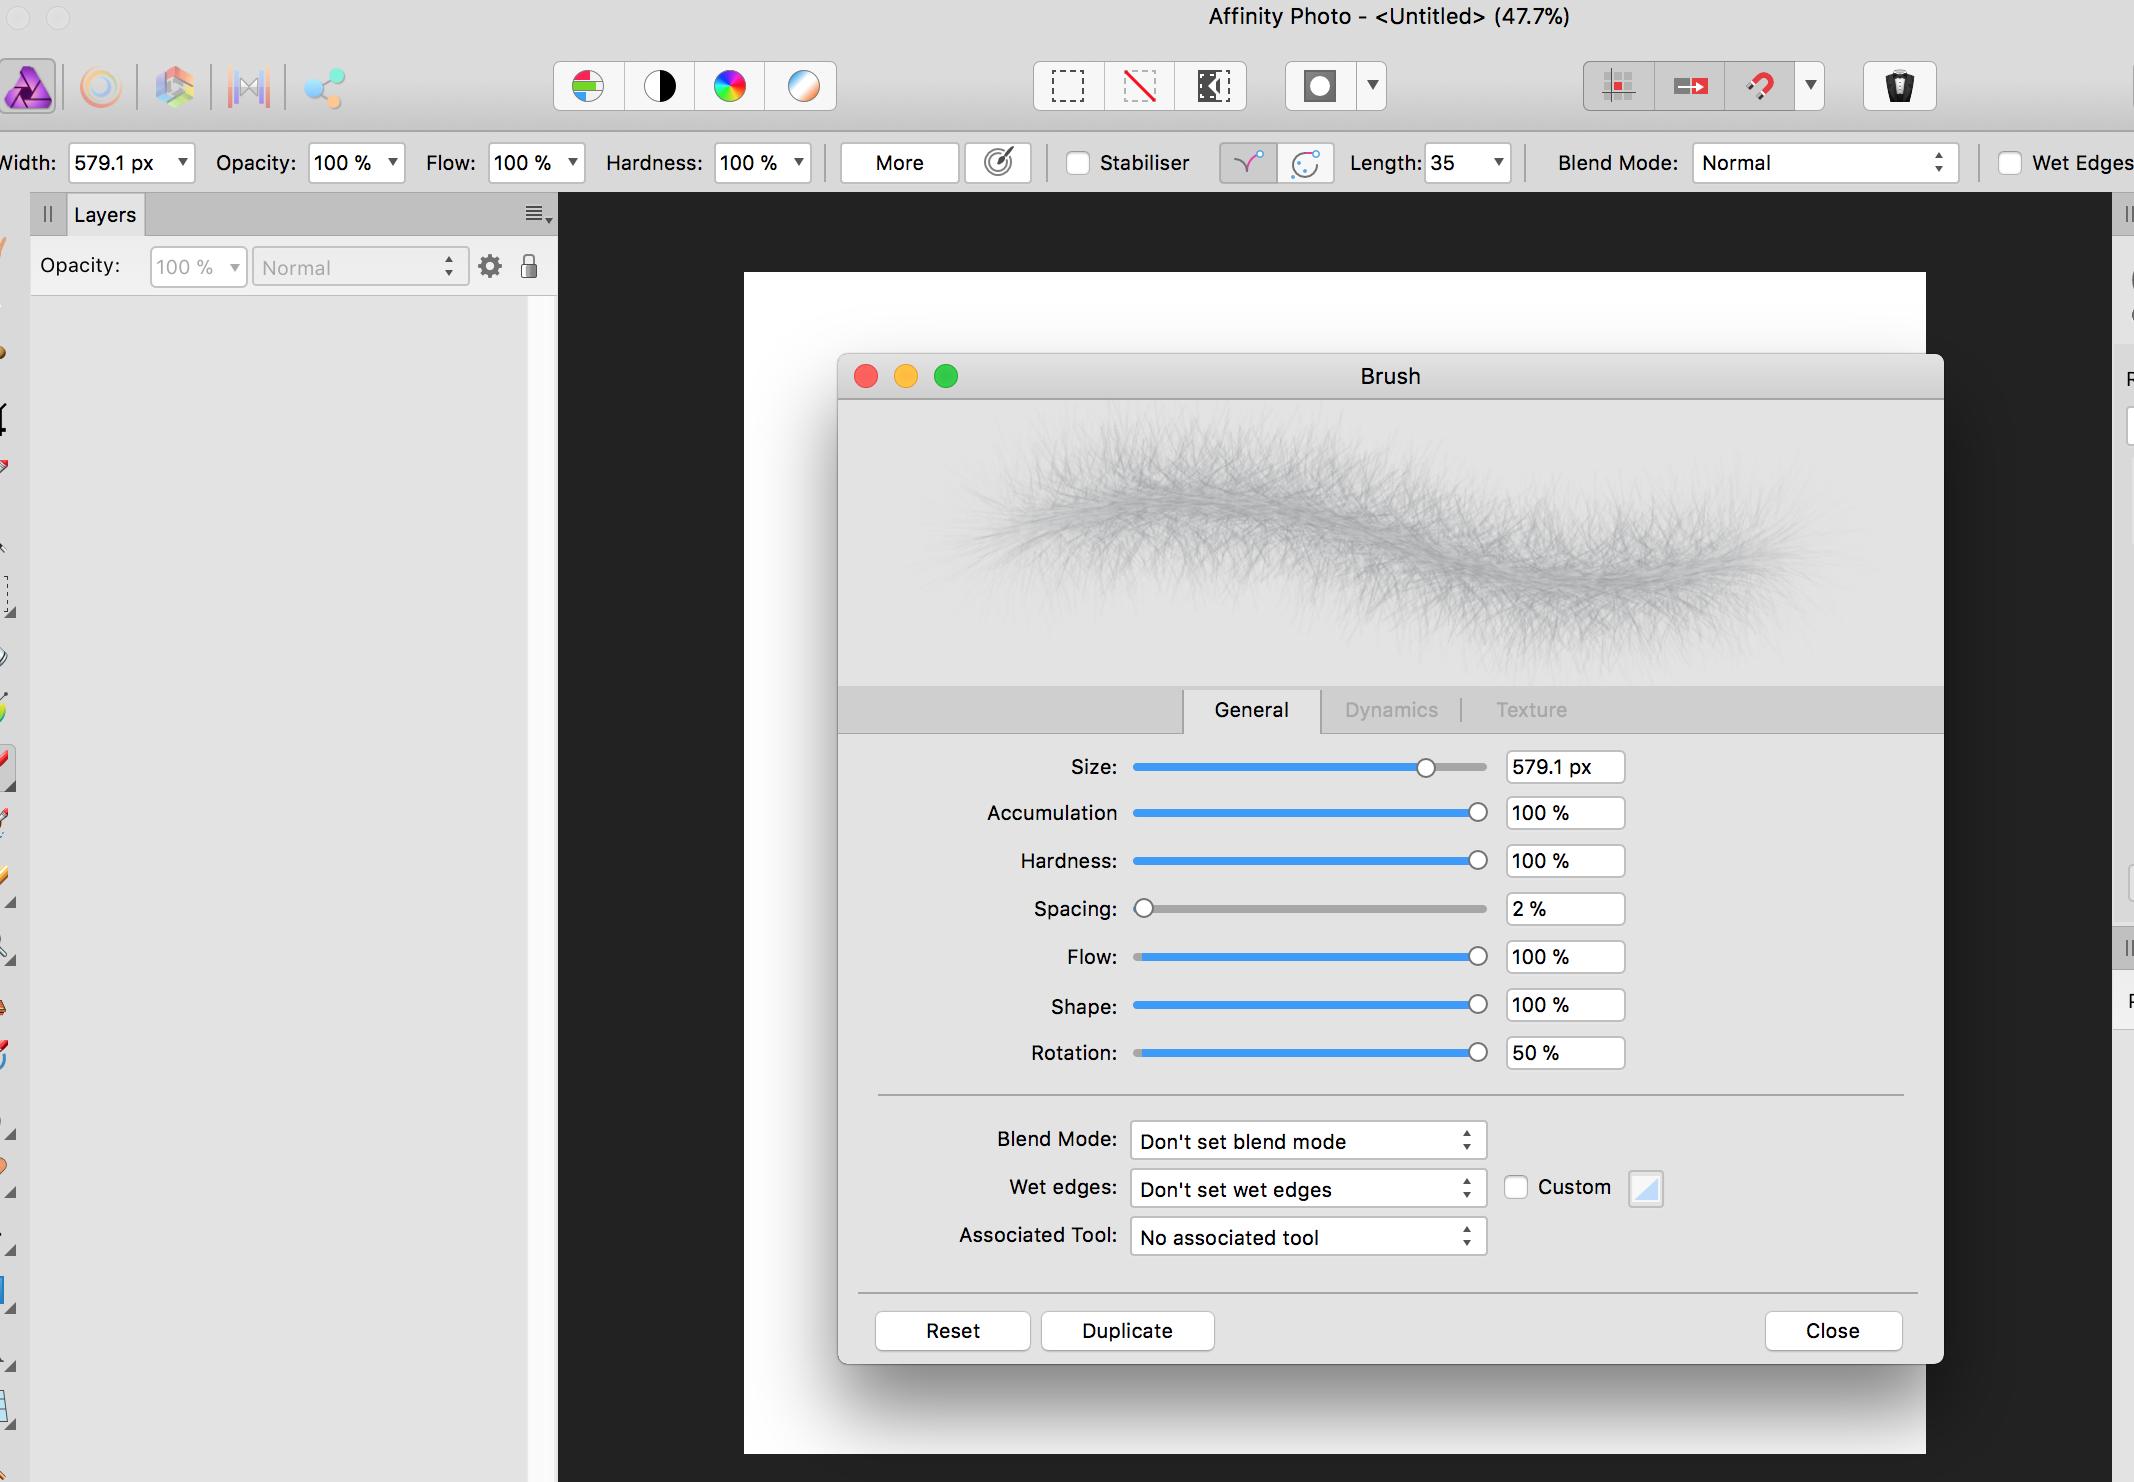 Brush won't reset to default - (Pre 1 7) Bugs on Mac